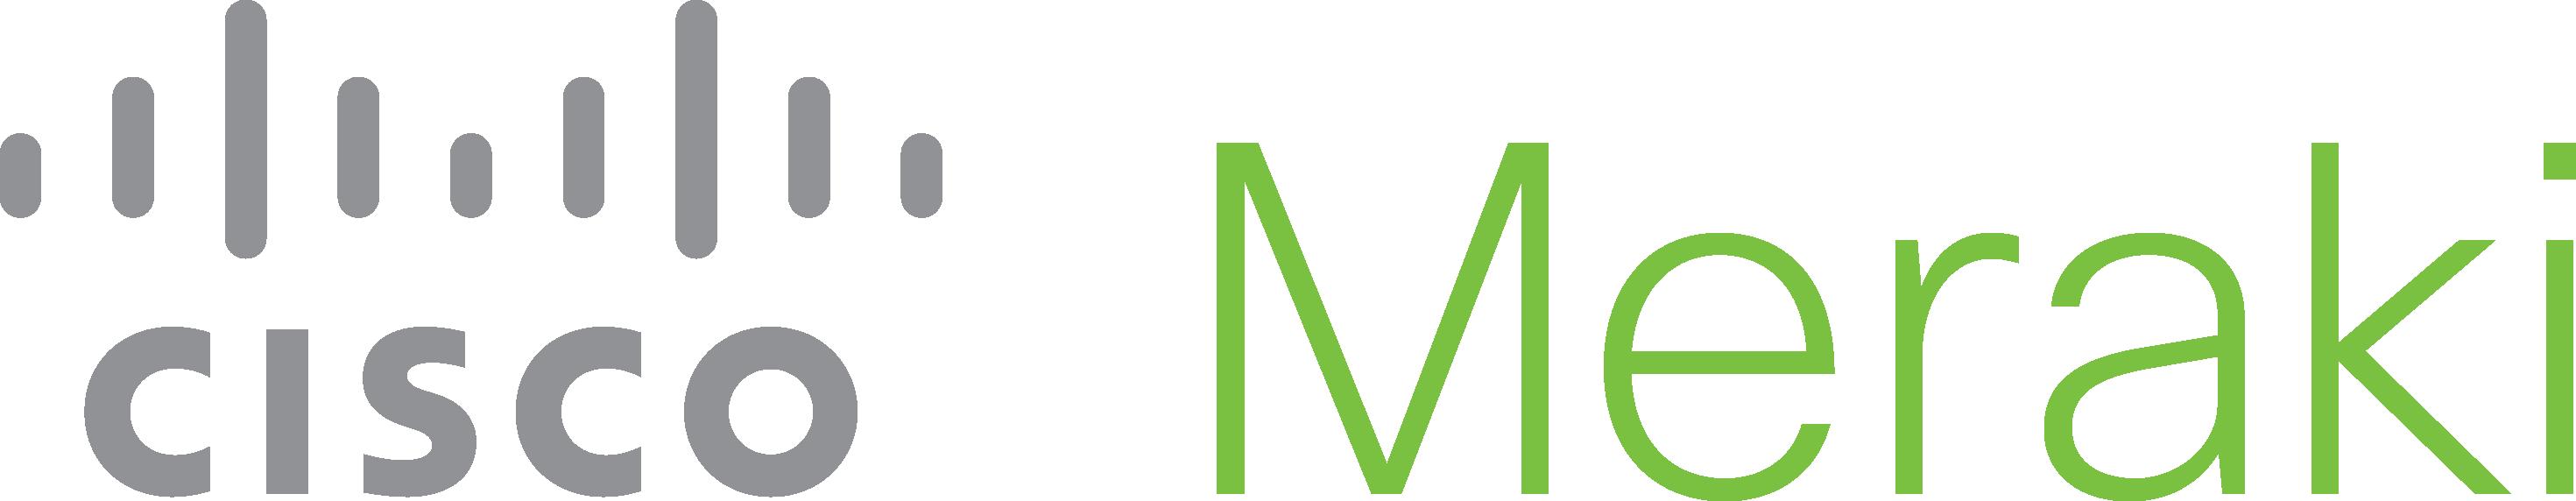 cisco meraki symbol png logo